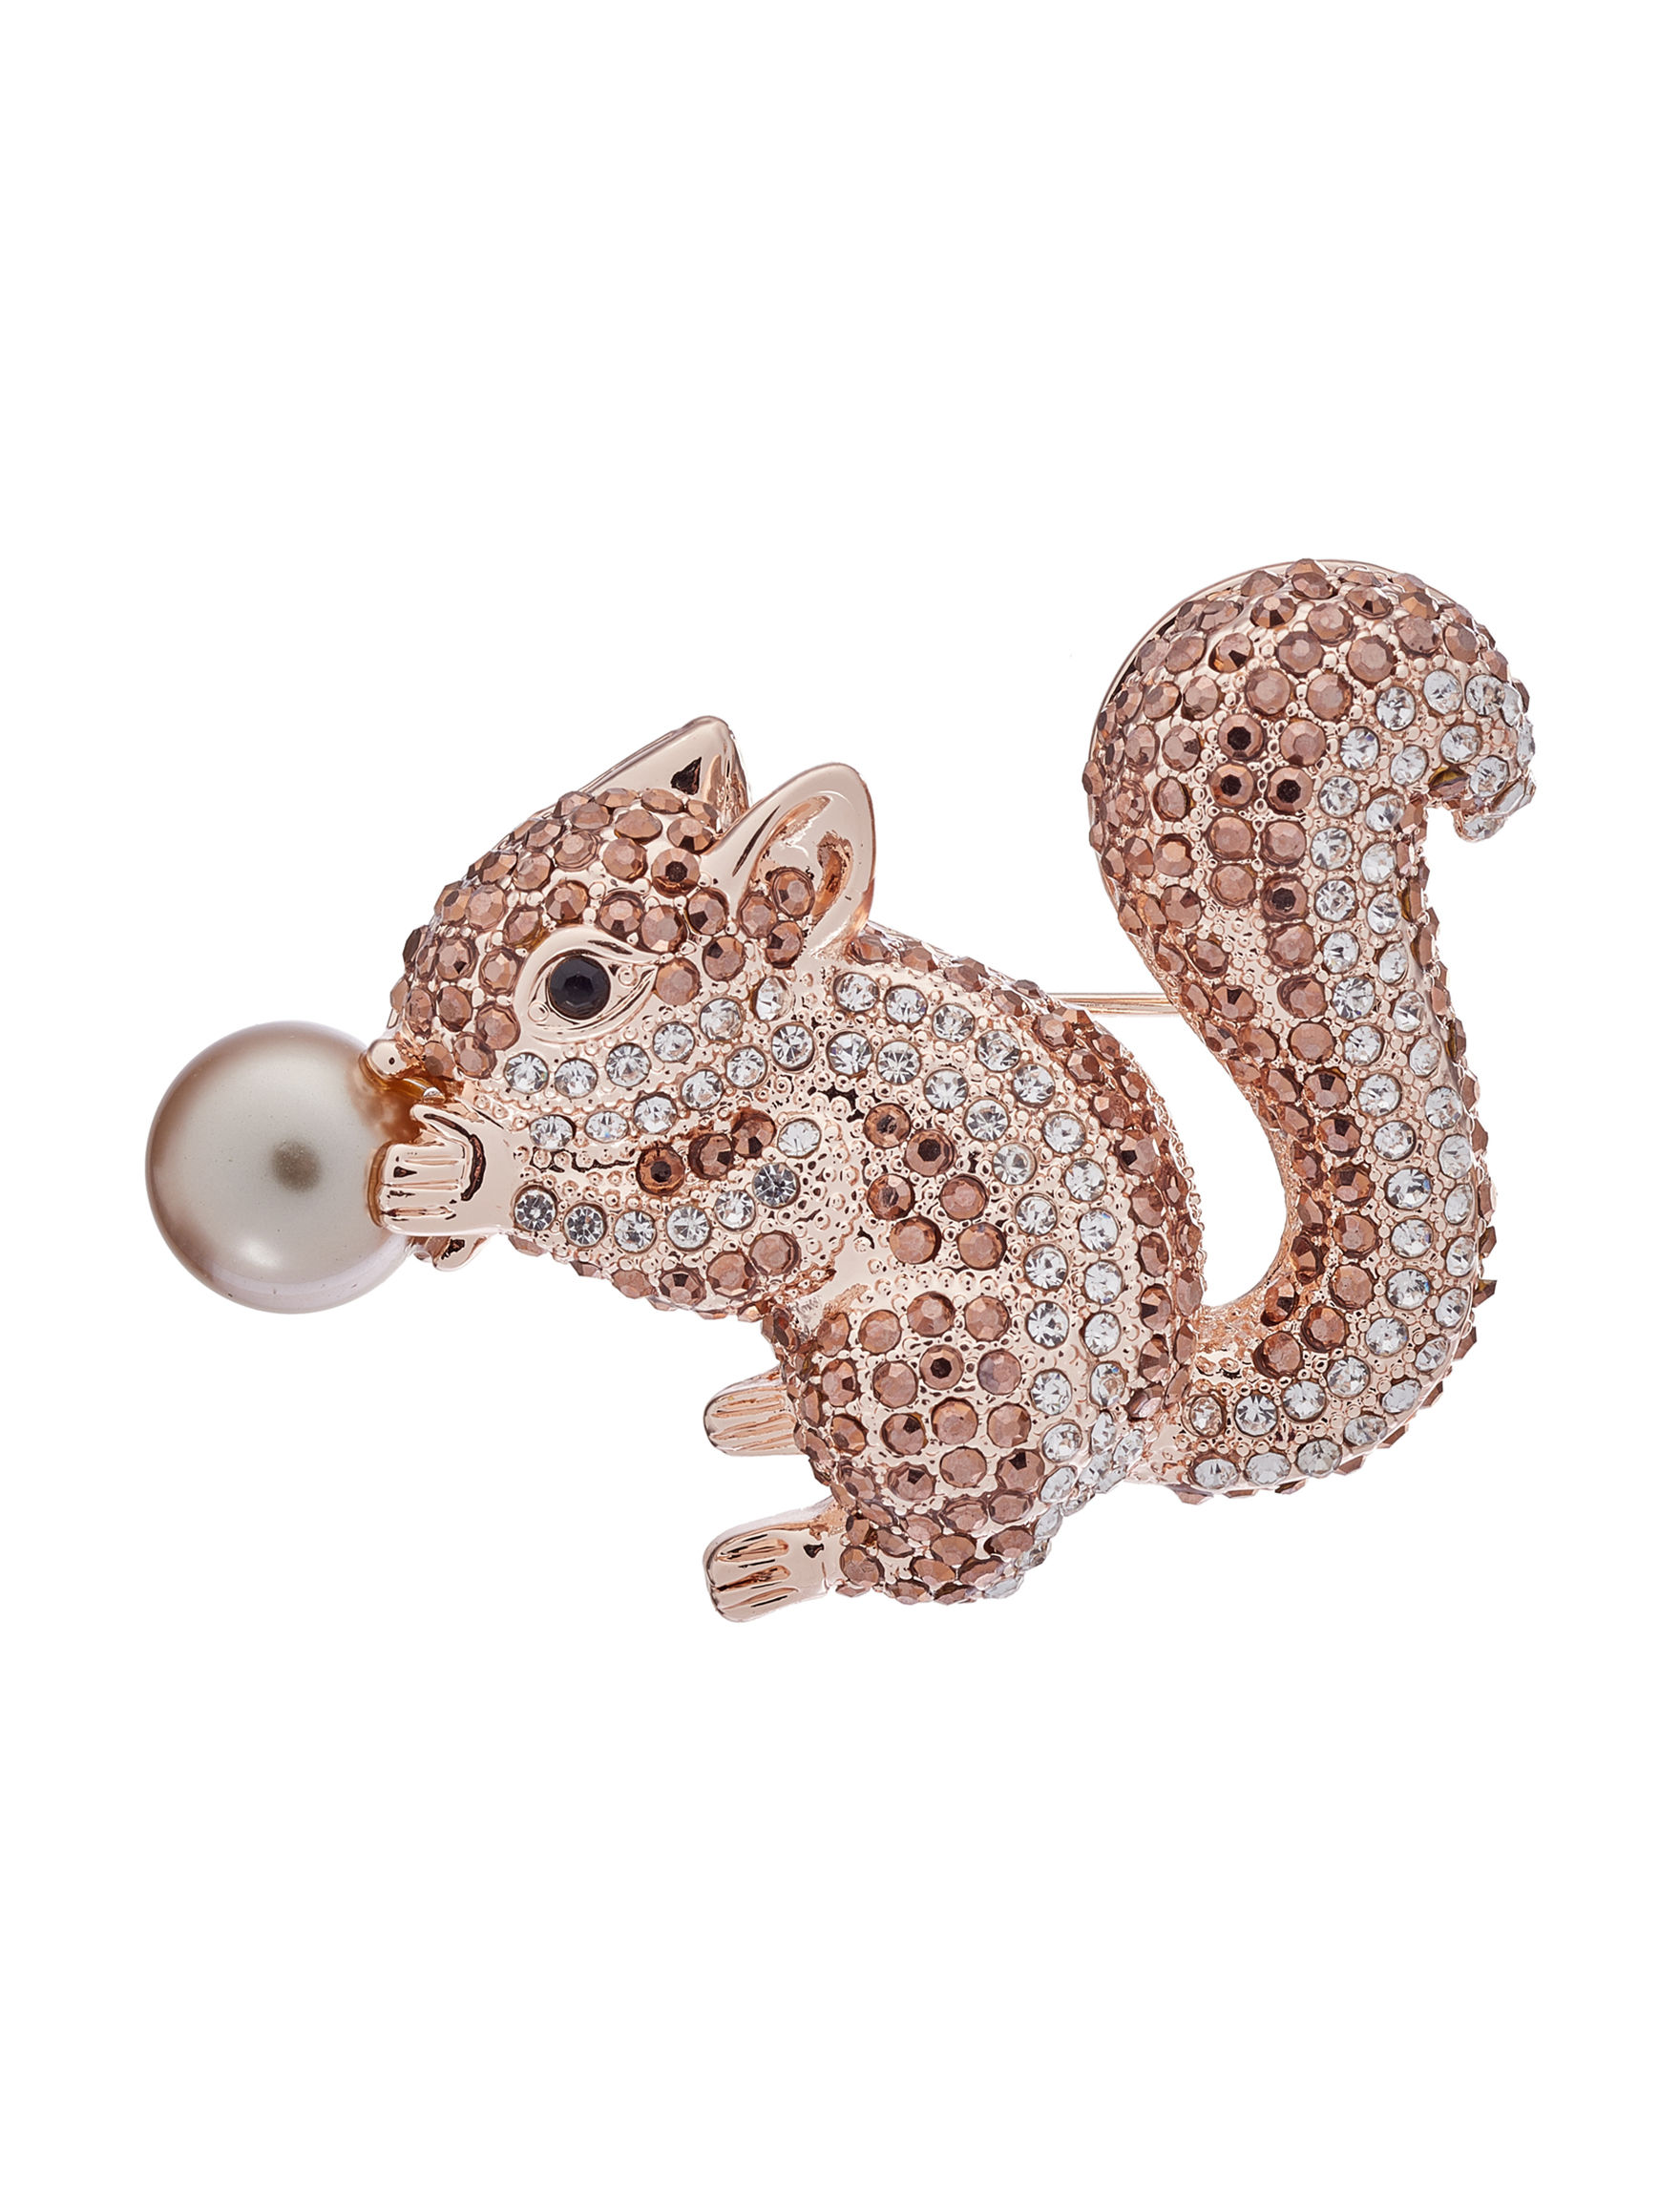 Napier Gold / Brown Multi Pins Fashion Jewelry